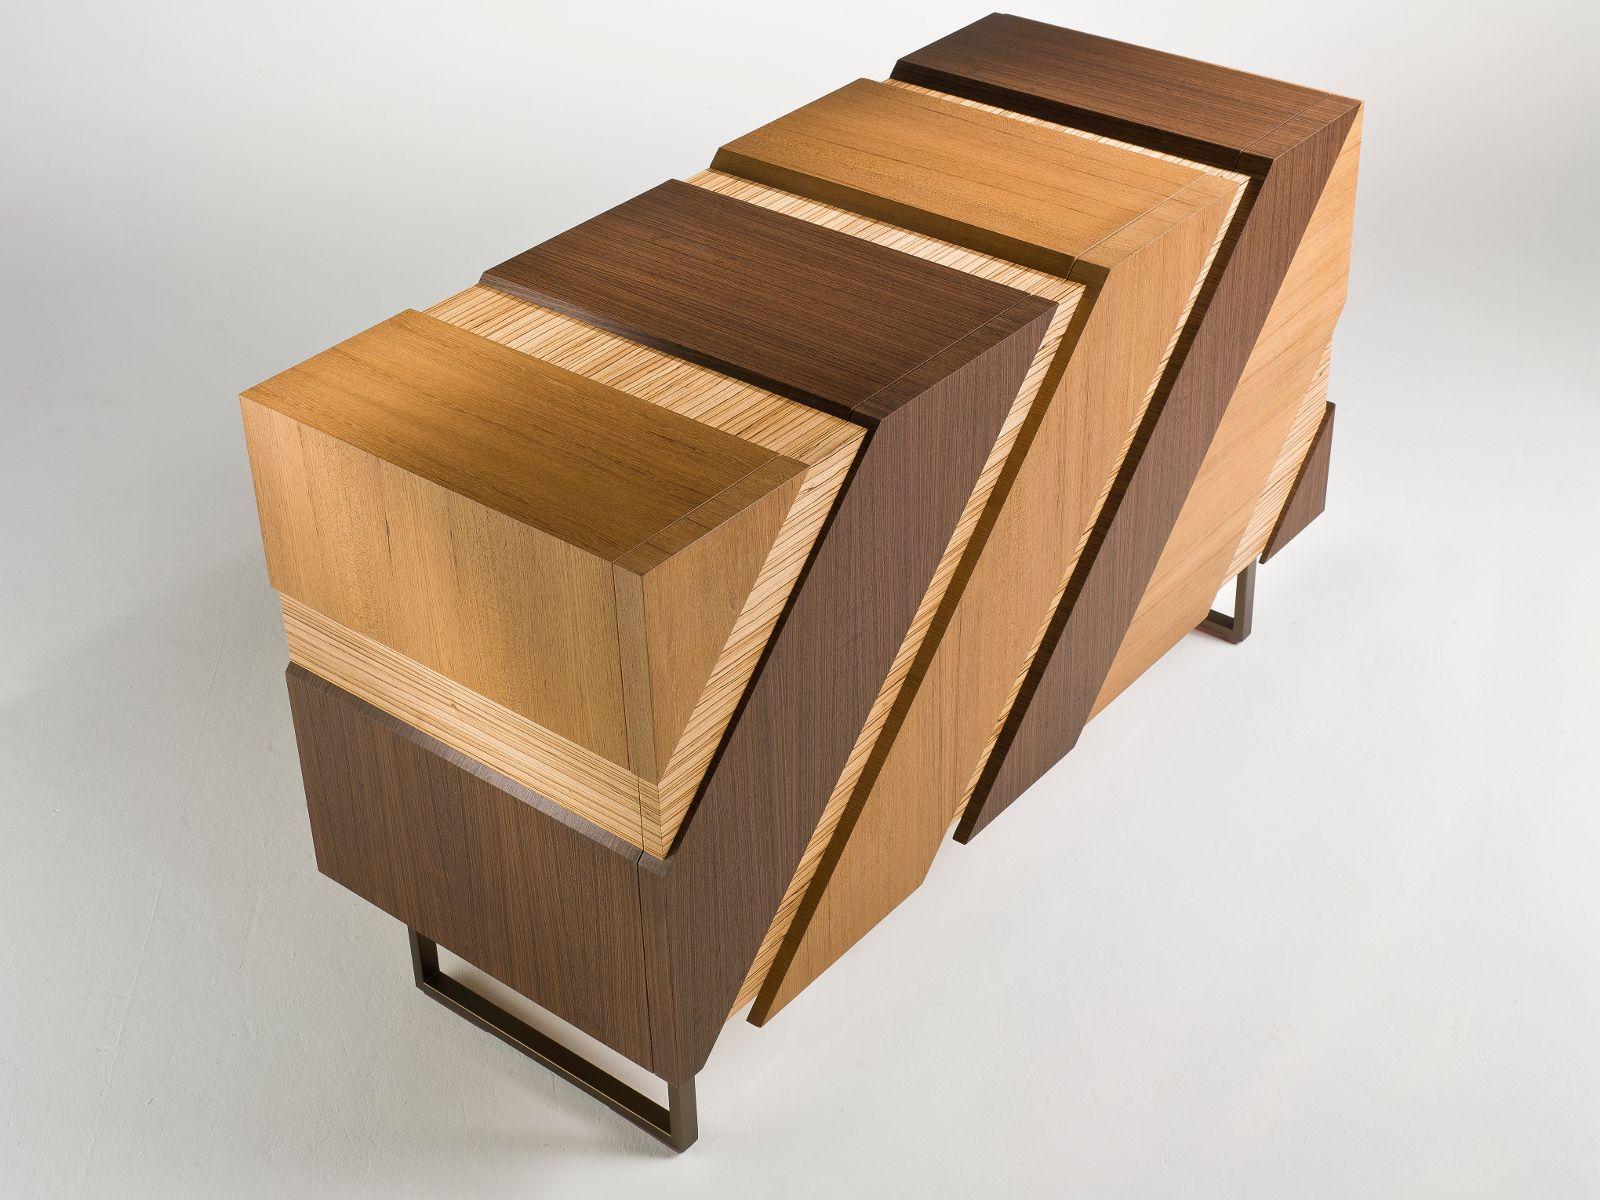 1200 #372311 Wooden Sideboard With Doors SLIDE By I 4 Mariani Design Alessandro  wallpaper Wooden Slide Doors 2351600